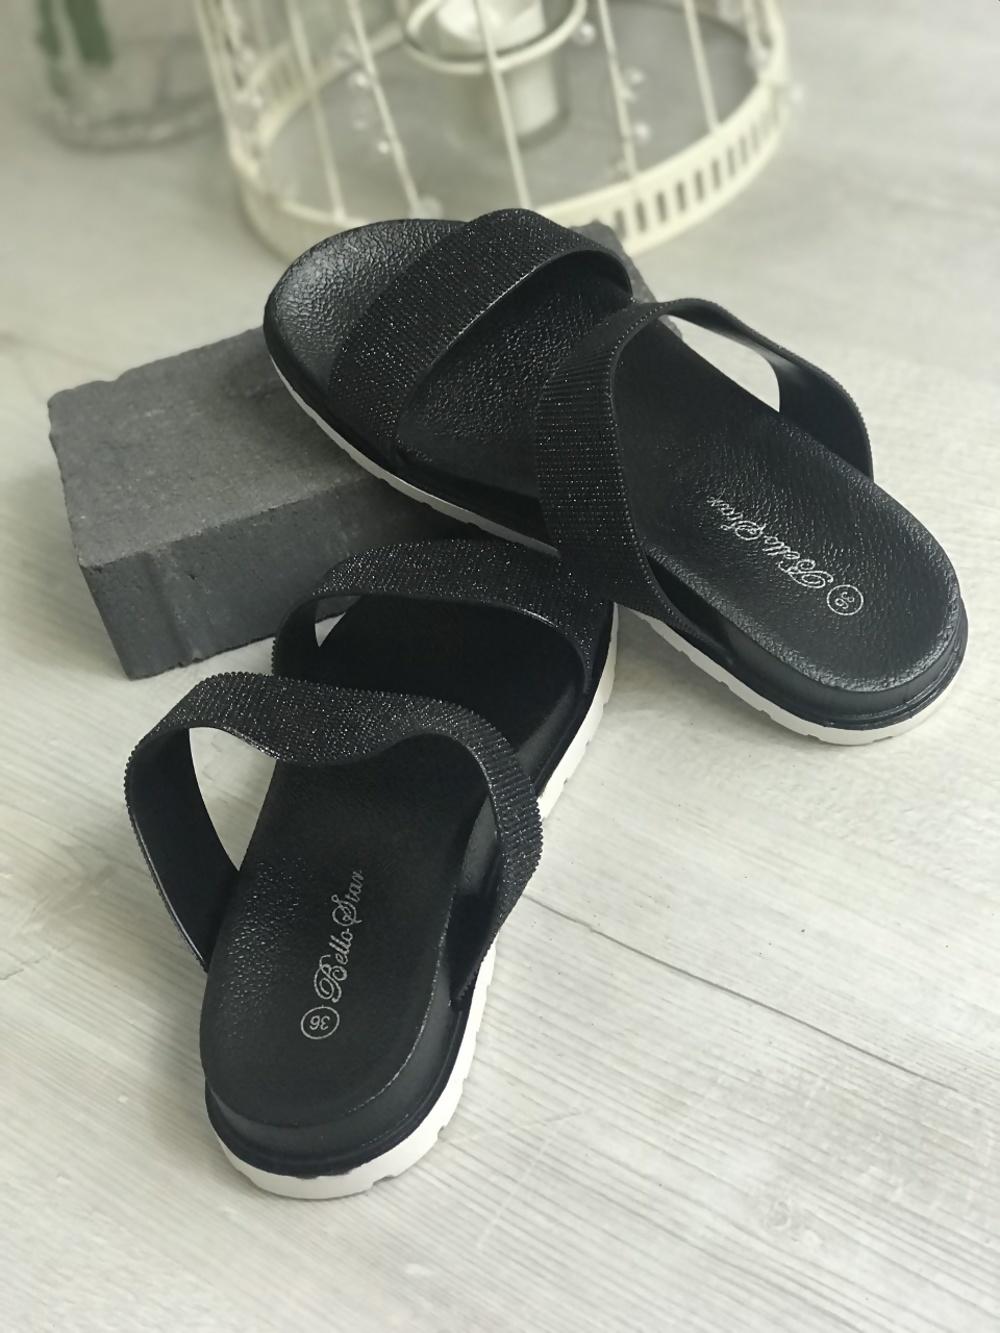 475c69071a9bb Black Glitter Sparkly Sandals